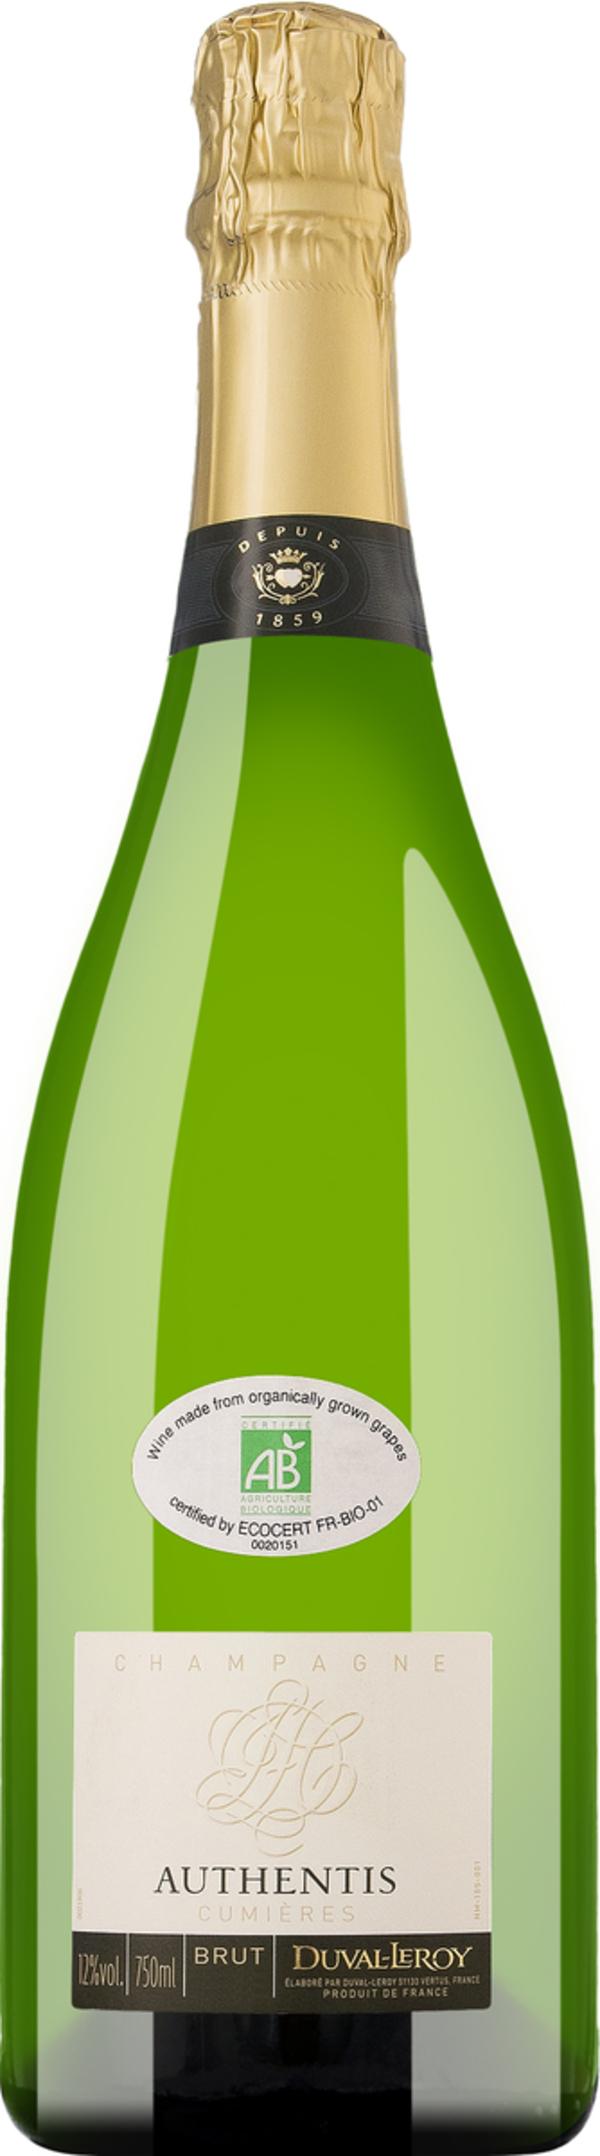 Champagne Duval-Leroy Authentis Cumières Brut   - Schaumwein, Frankreich, brut, 0,75l